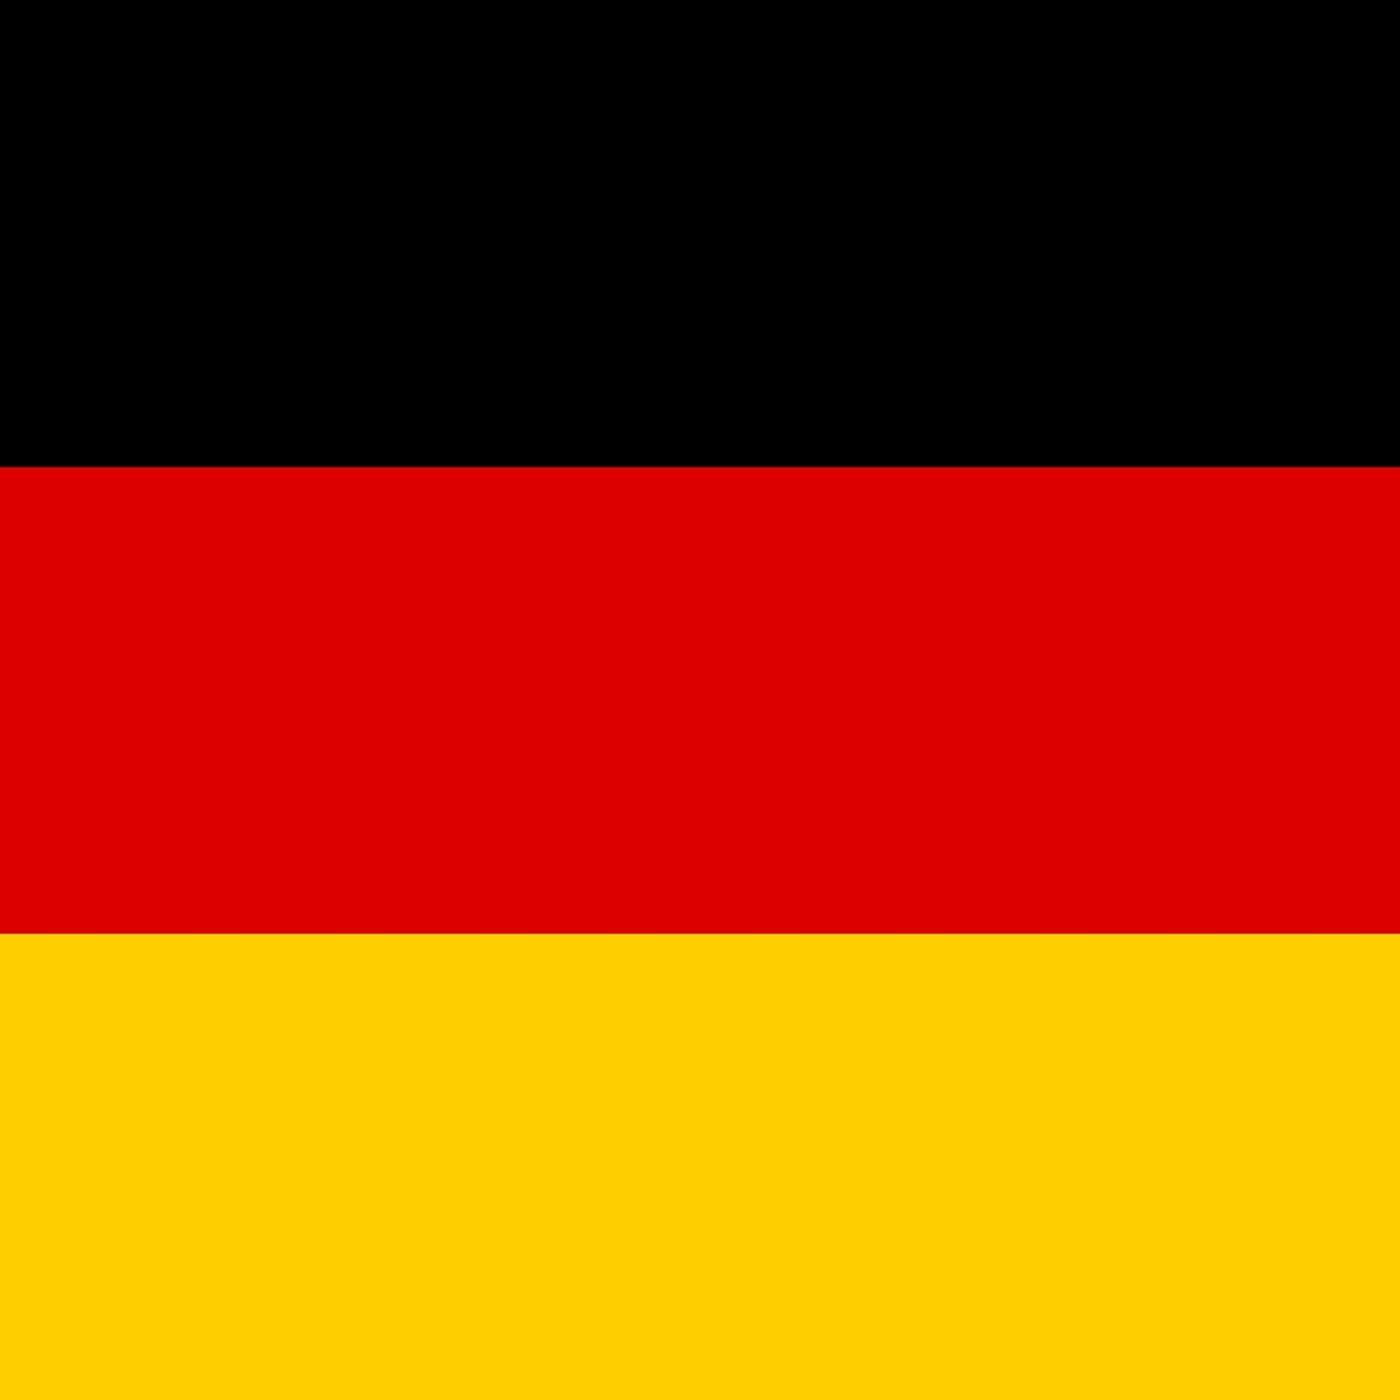 Merkl Remains Source Code For German Fragmentation & Politial Paralysis